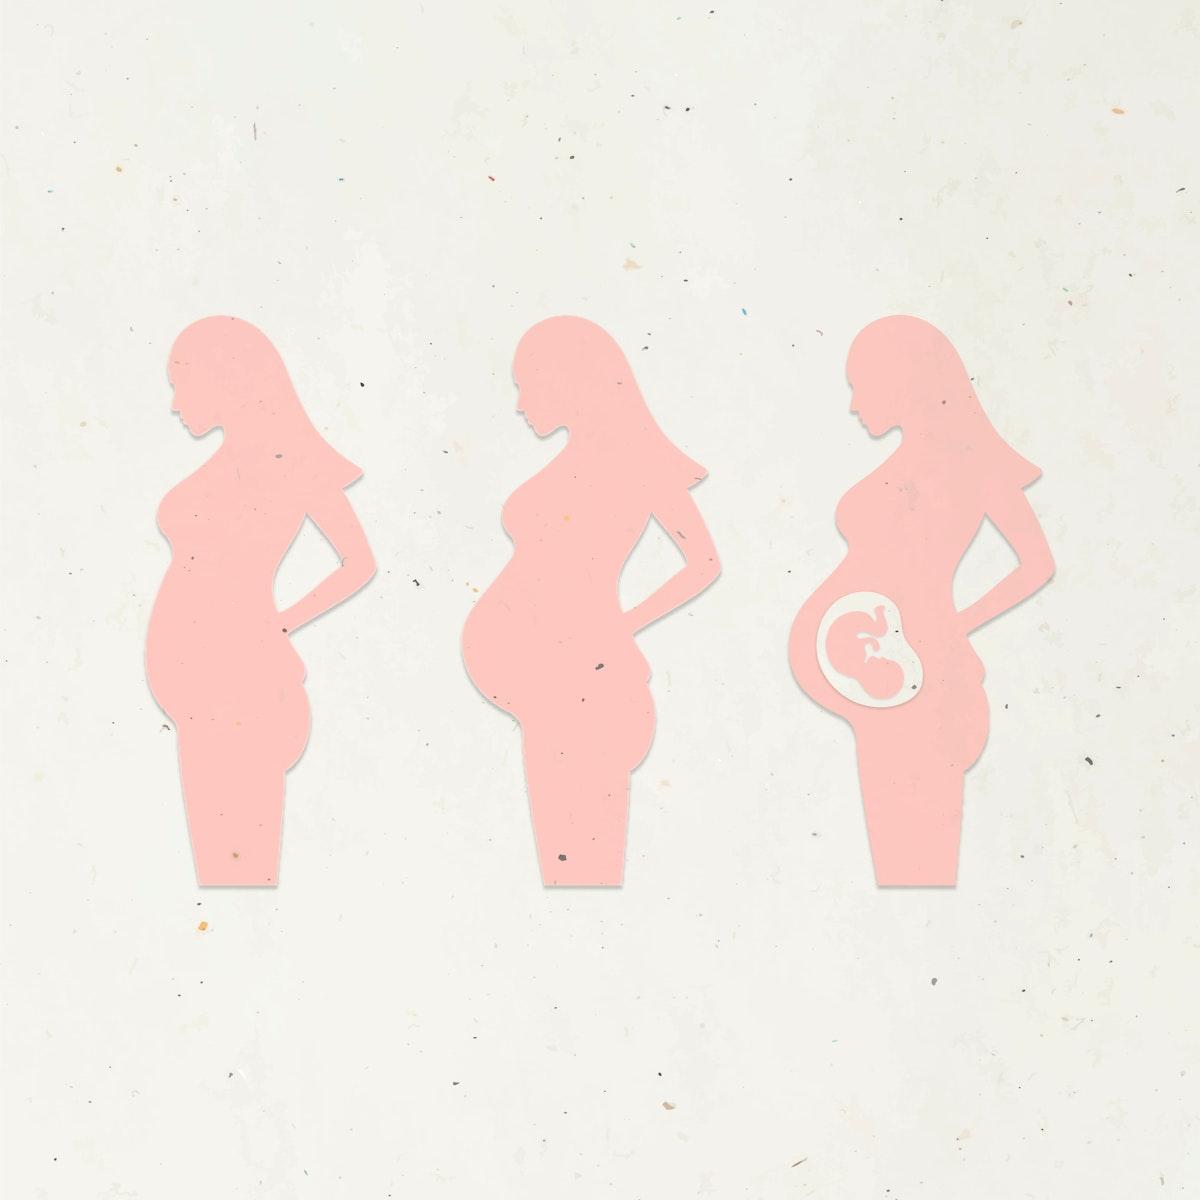 Paper craft pregnant woman character set vector